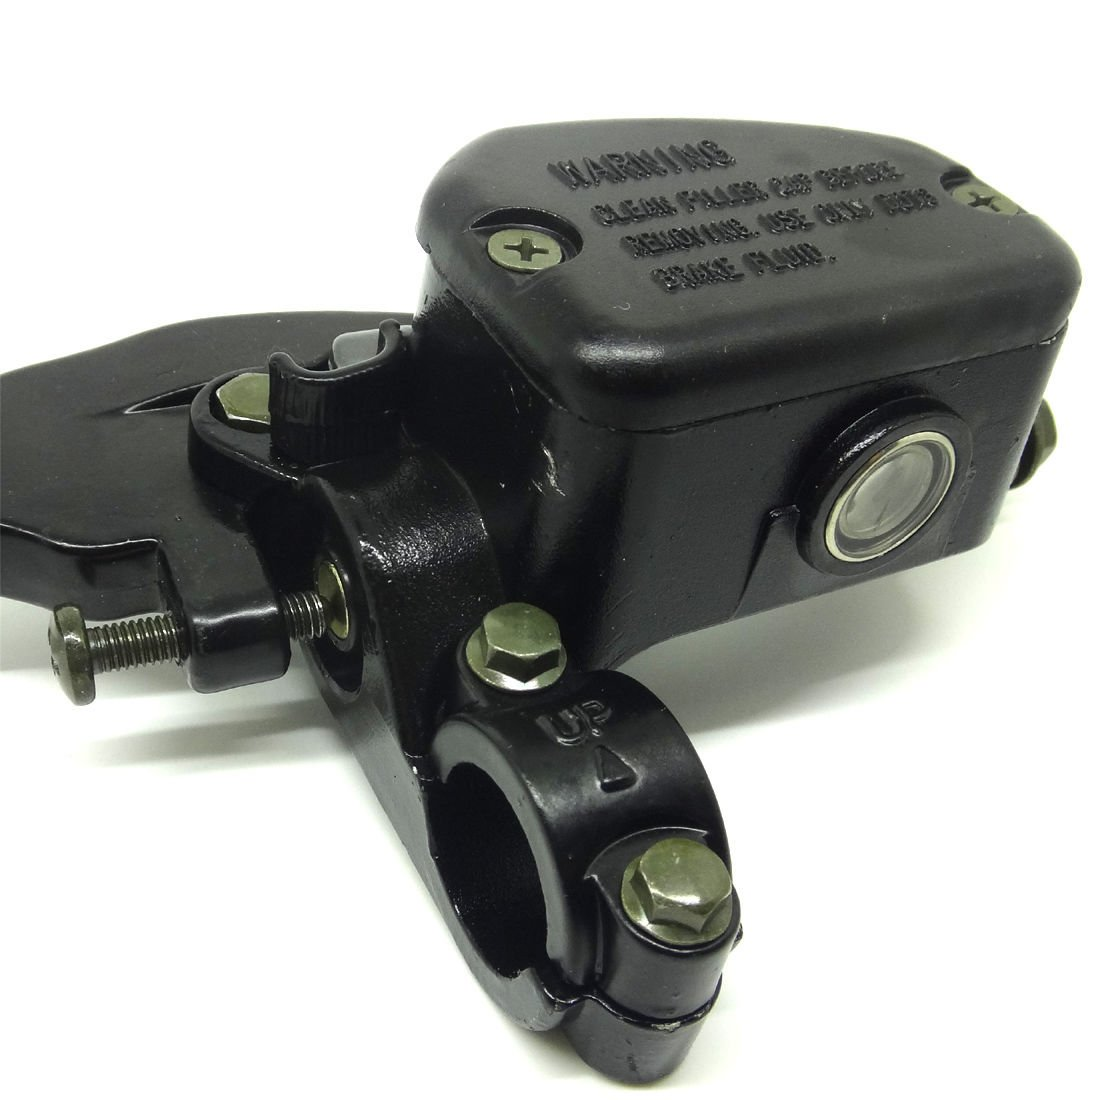 Yihao New Front Left Brake Master Cylinder for Polaris Many Applications 2000 Polaris Trail Boss 325 A00Aa32Aa//Ab//Ca Zz2225